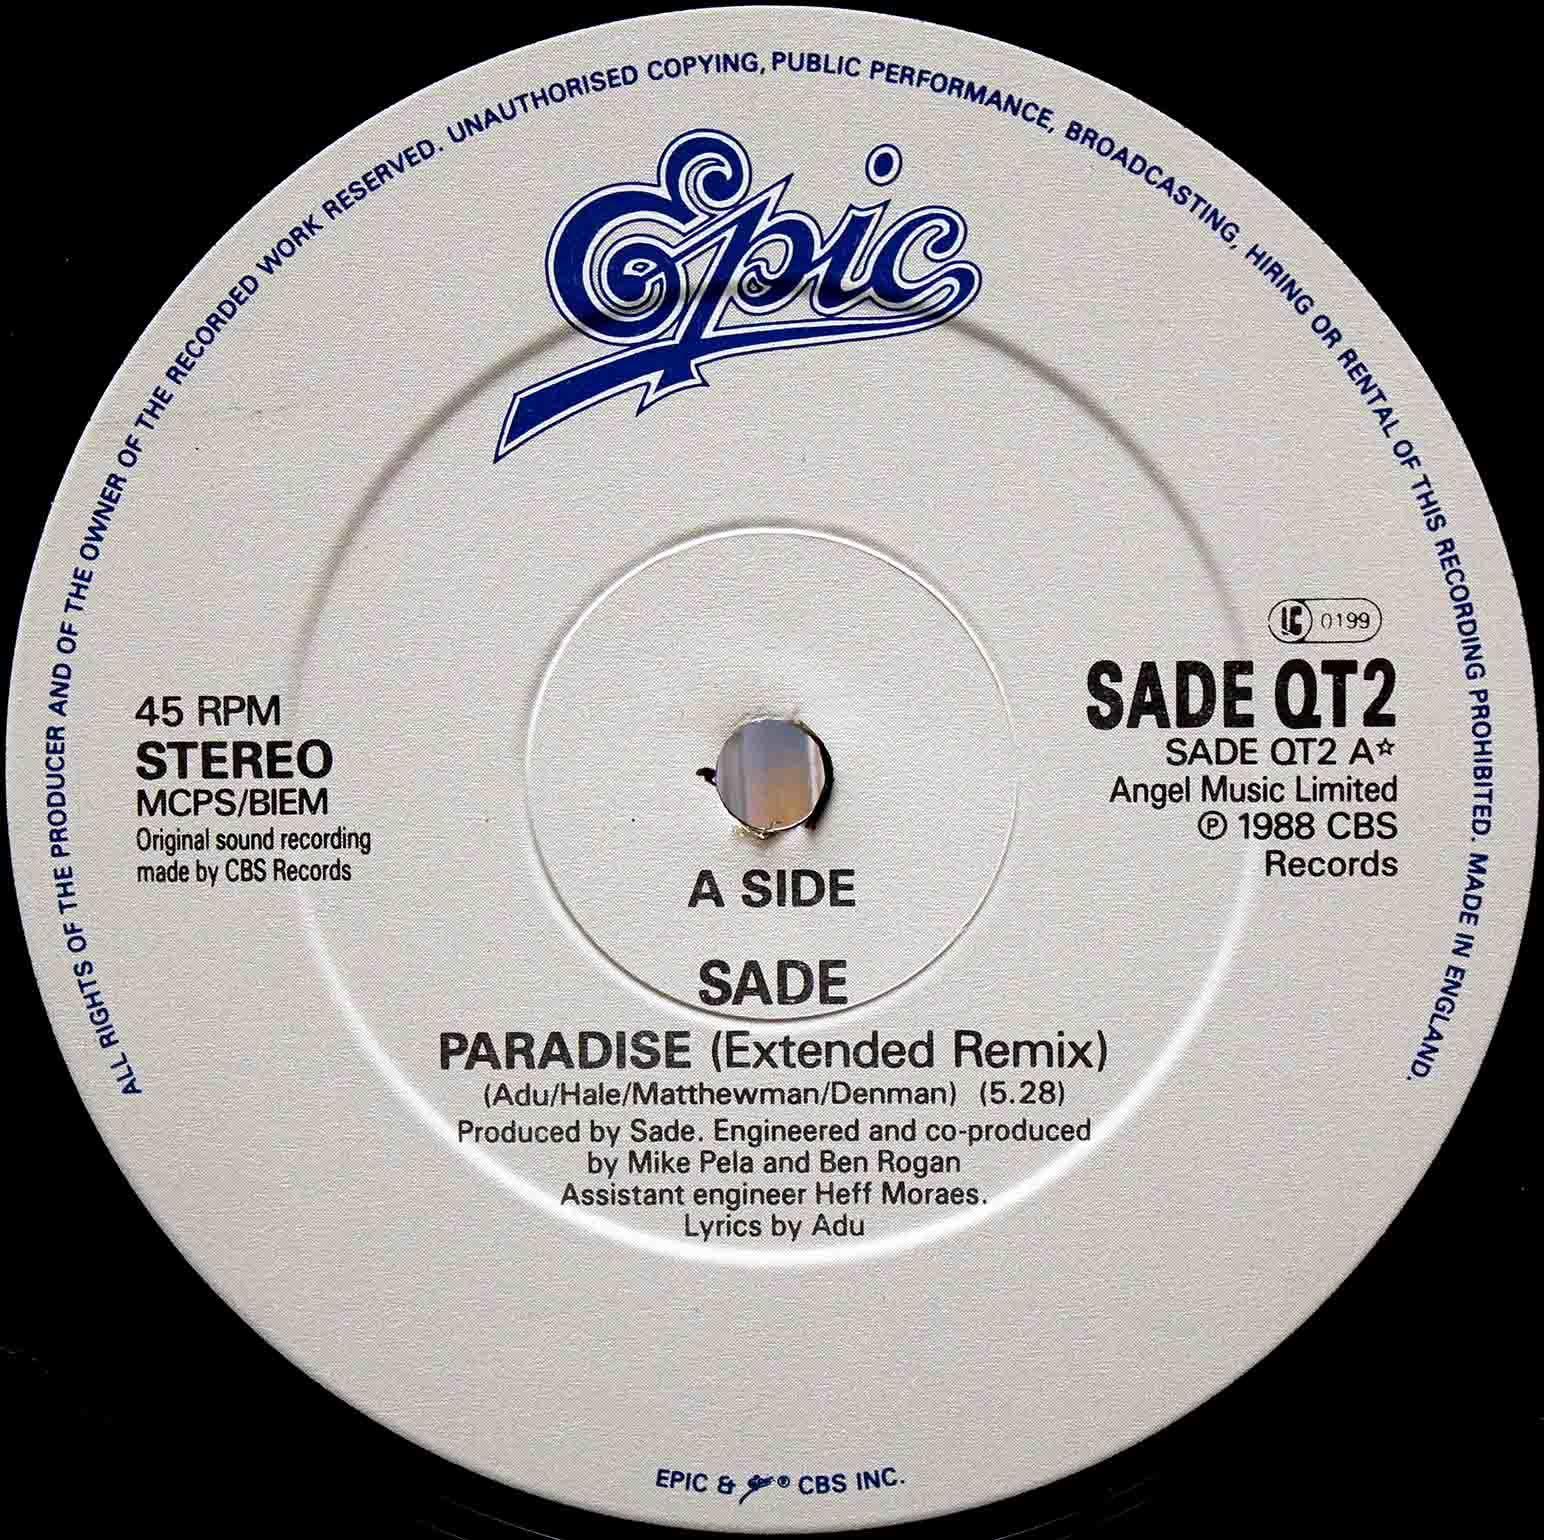 sade - Paradise 03